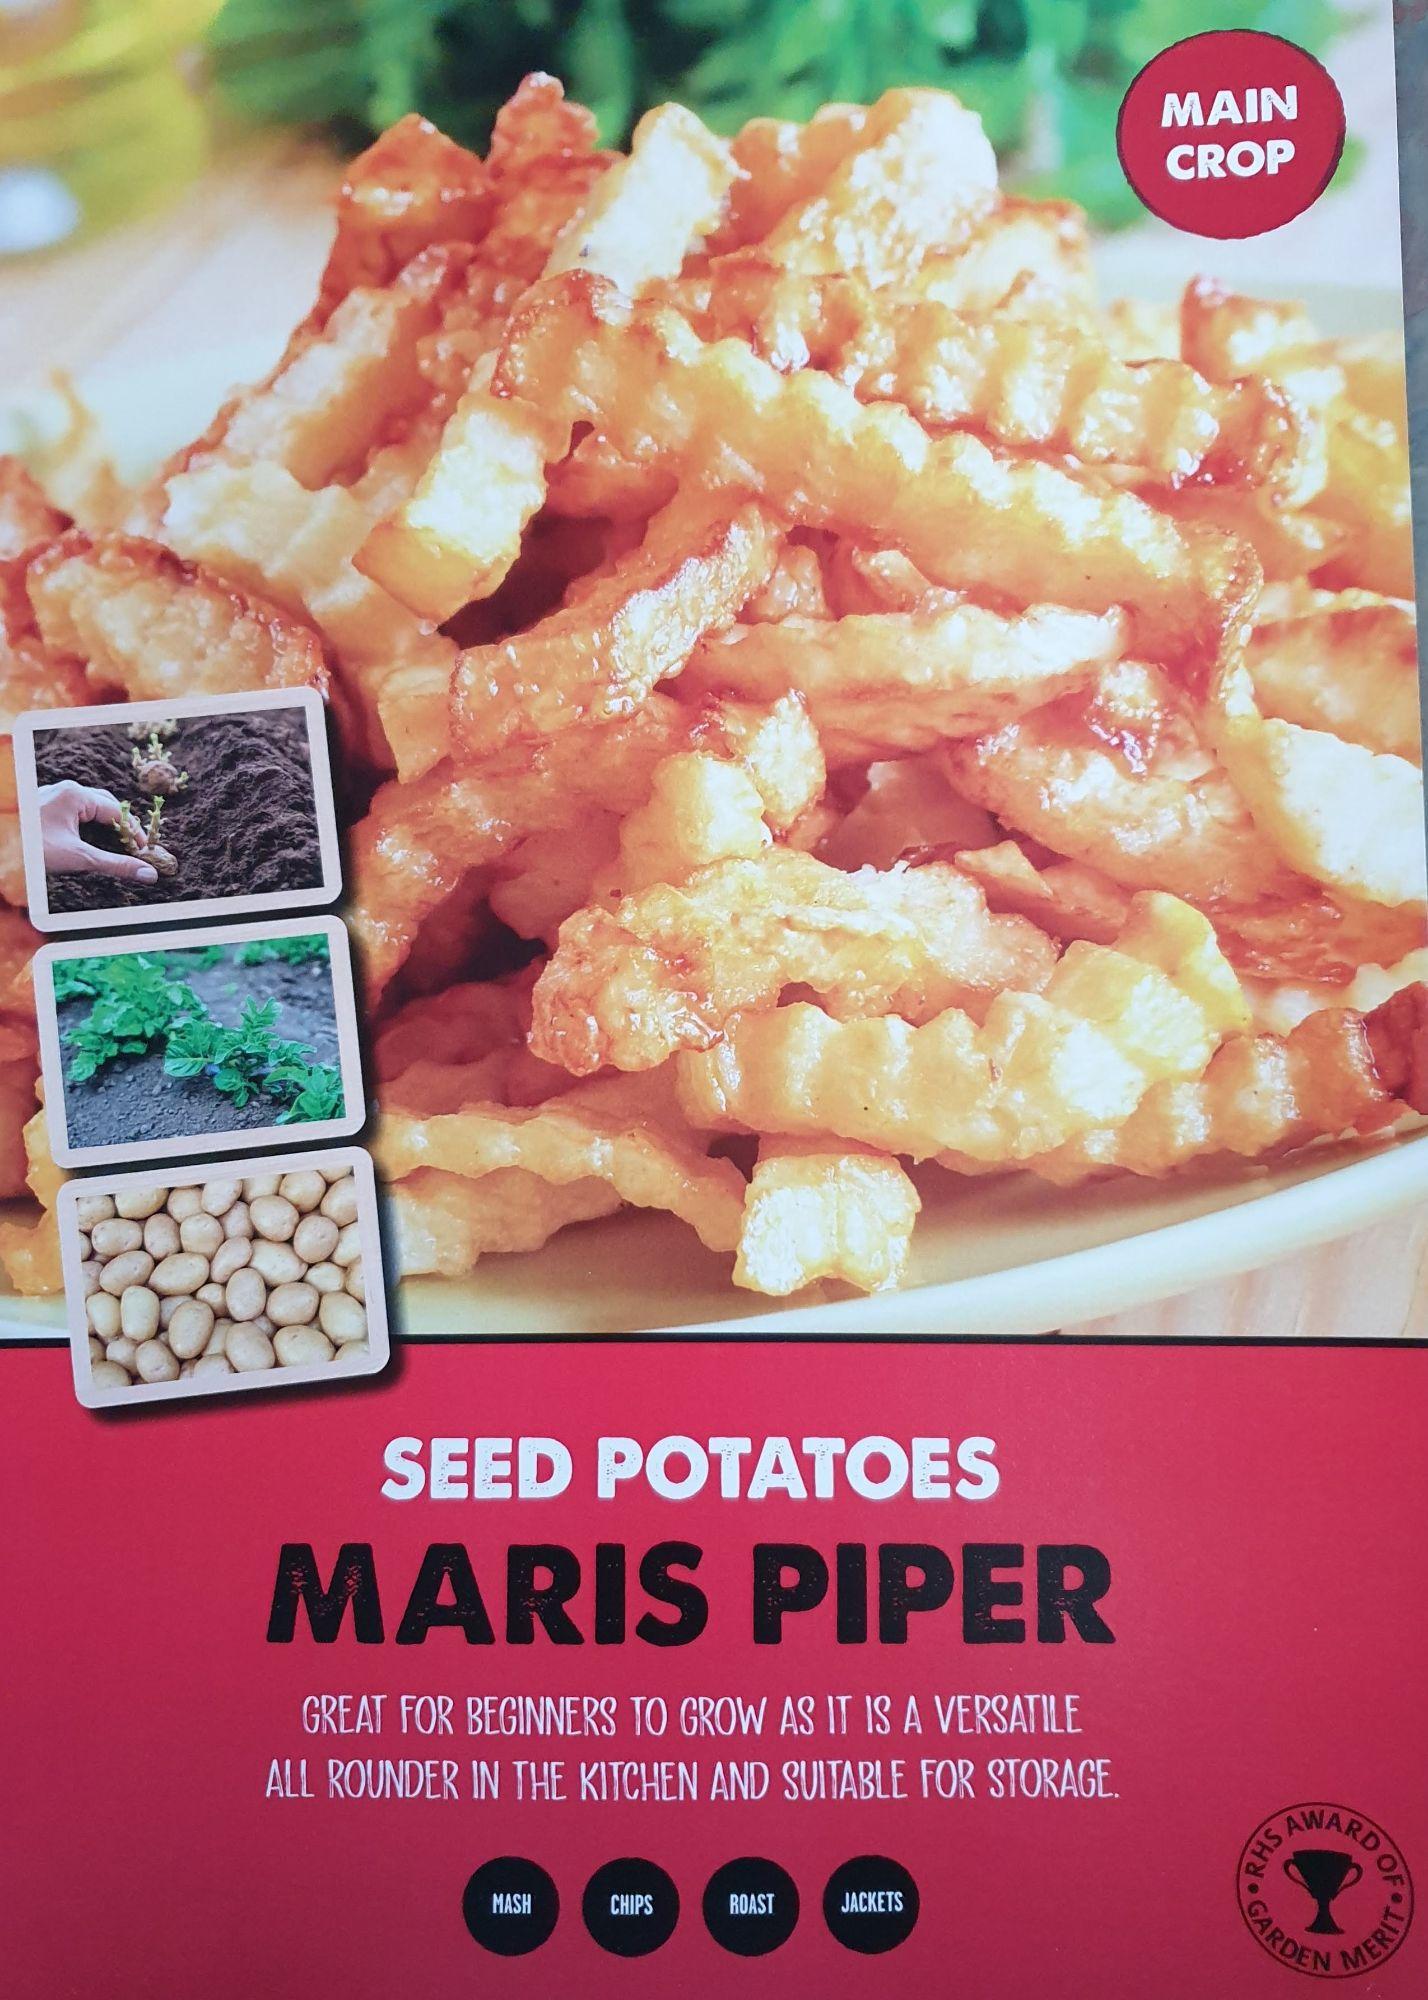 maris_piper_seed_potato_info.jpg